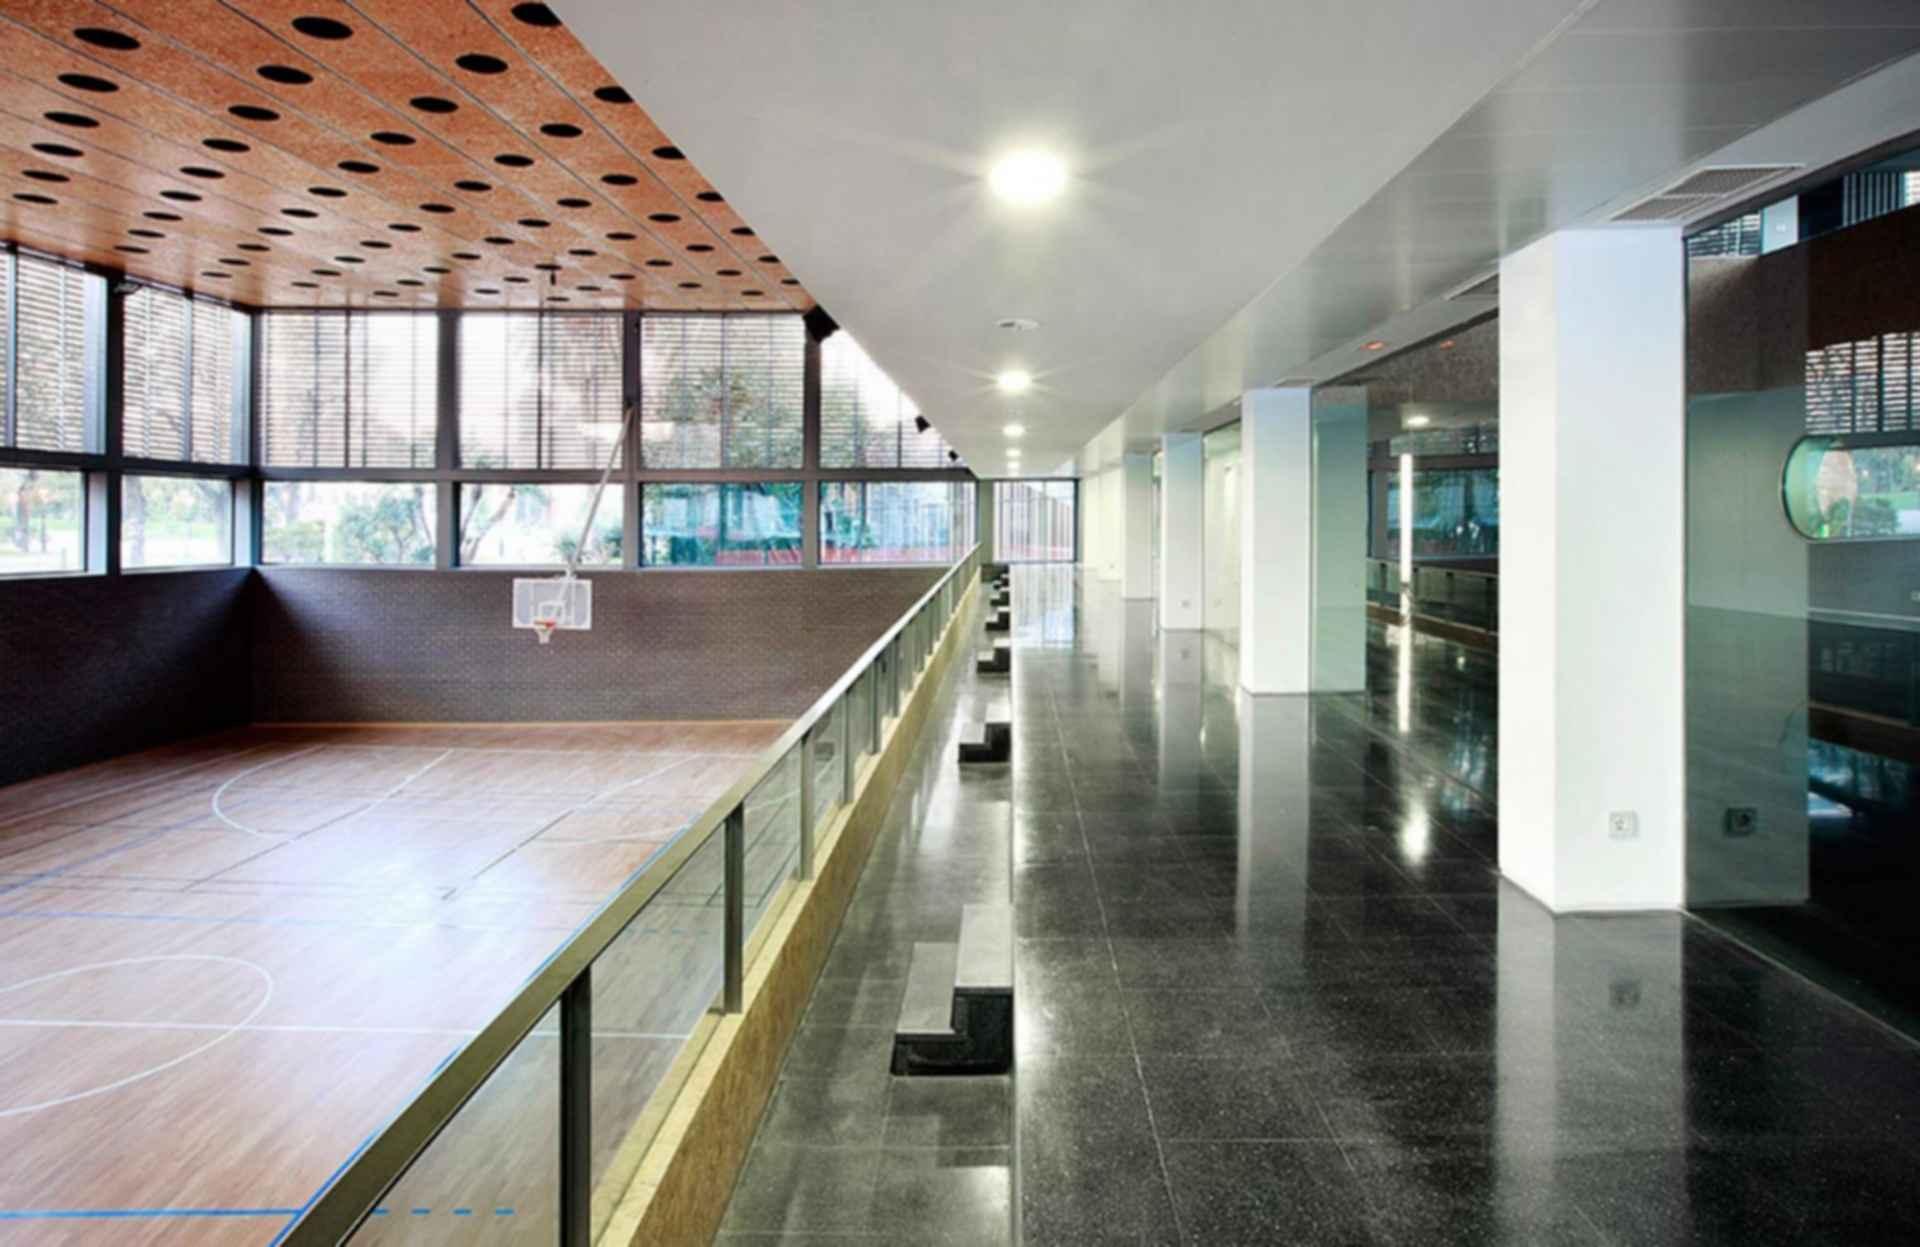 Ciutadella Park Sports Center - Interior/Basketball Court